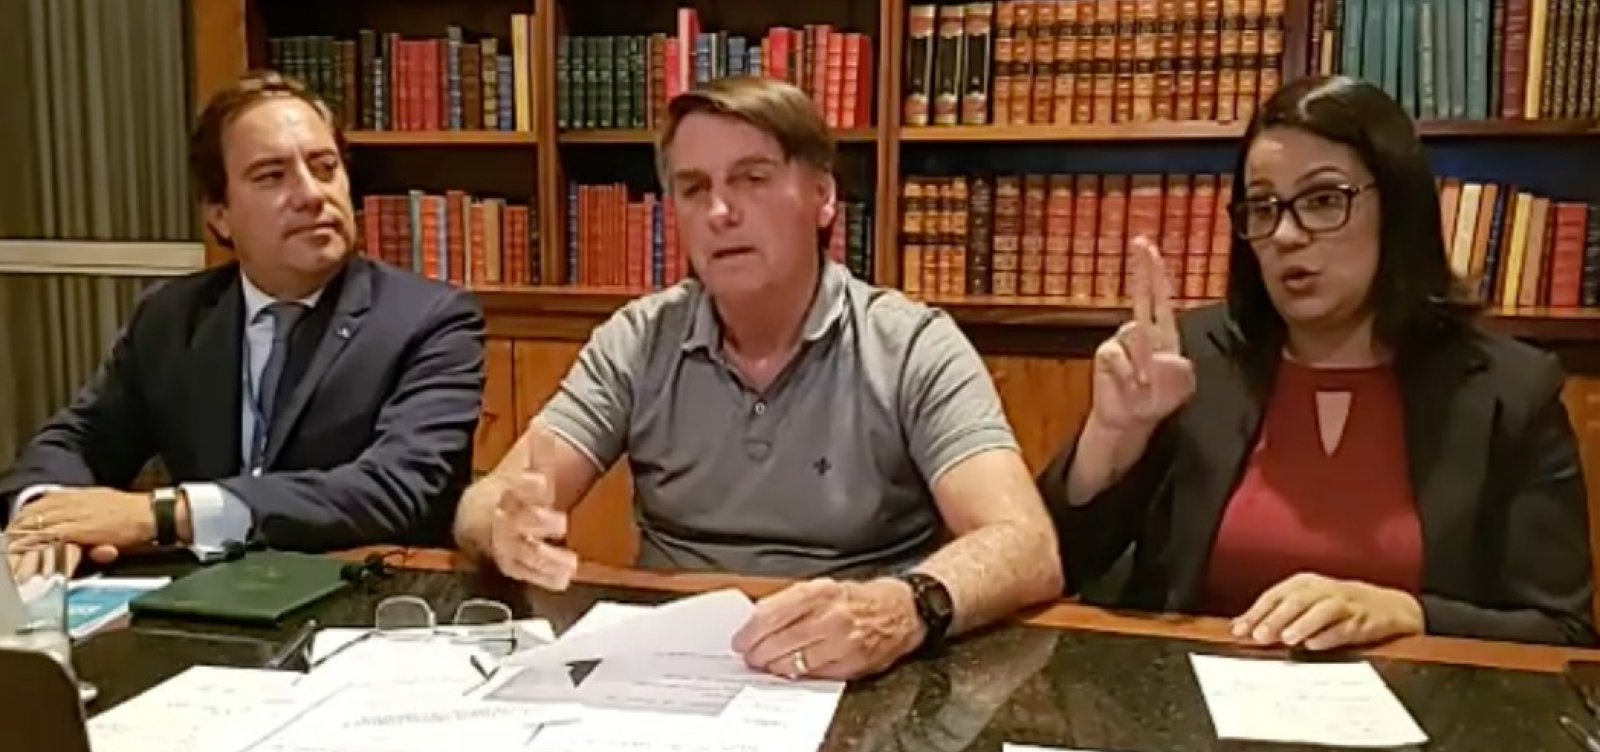 [Em dia de recorde de mortes por Covid-19 no Brasil, Bolsonaro fala contra uso de máscaras]